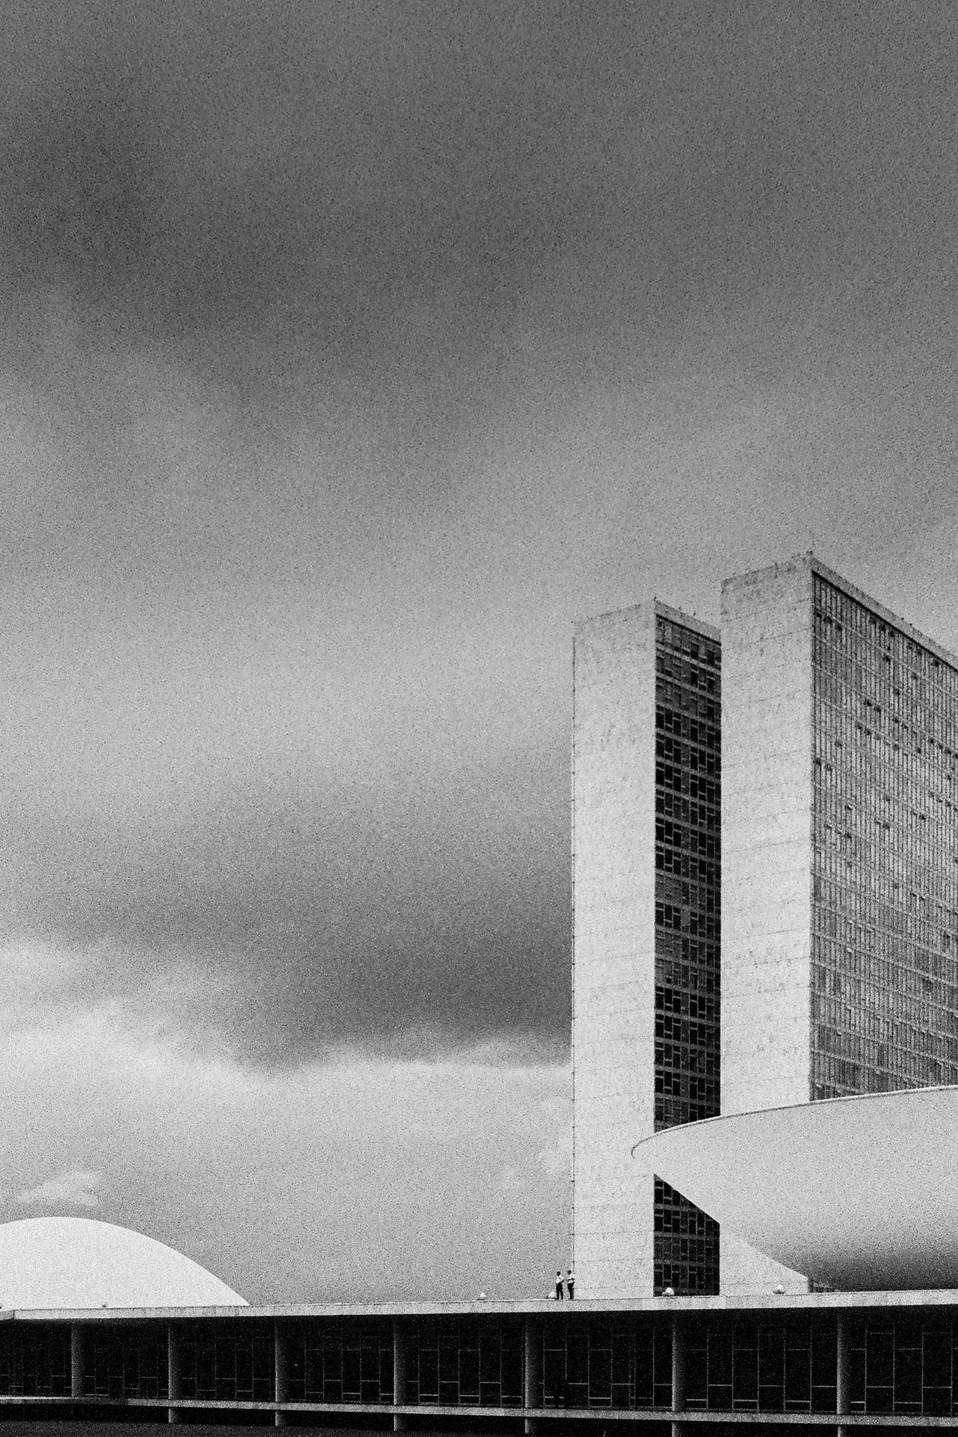 Palácio do Congresso Nacional (1960) Oscar Niemeyer & Joaquim Cardoso Brasília, Brasil   . Analogic 2016 © Jérémy Pernet